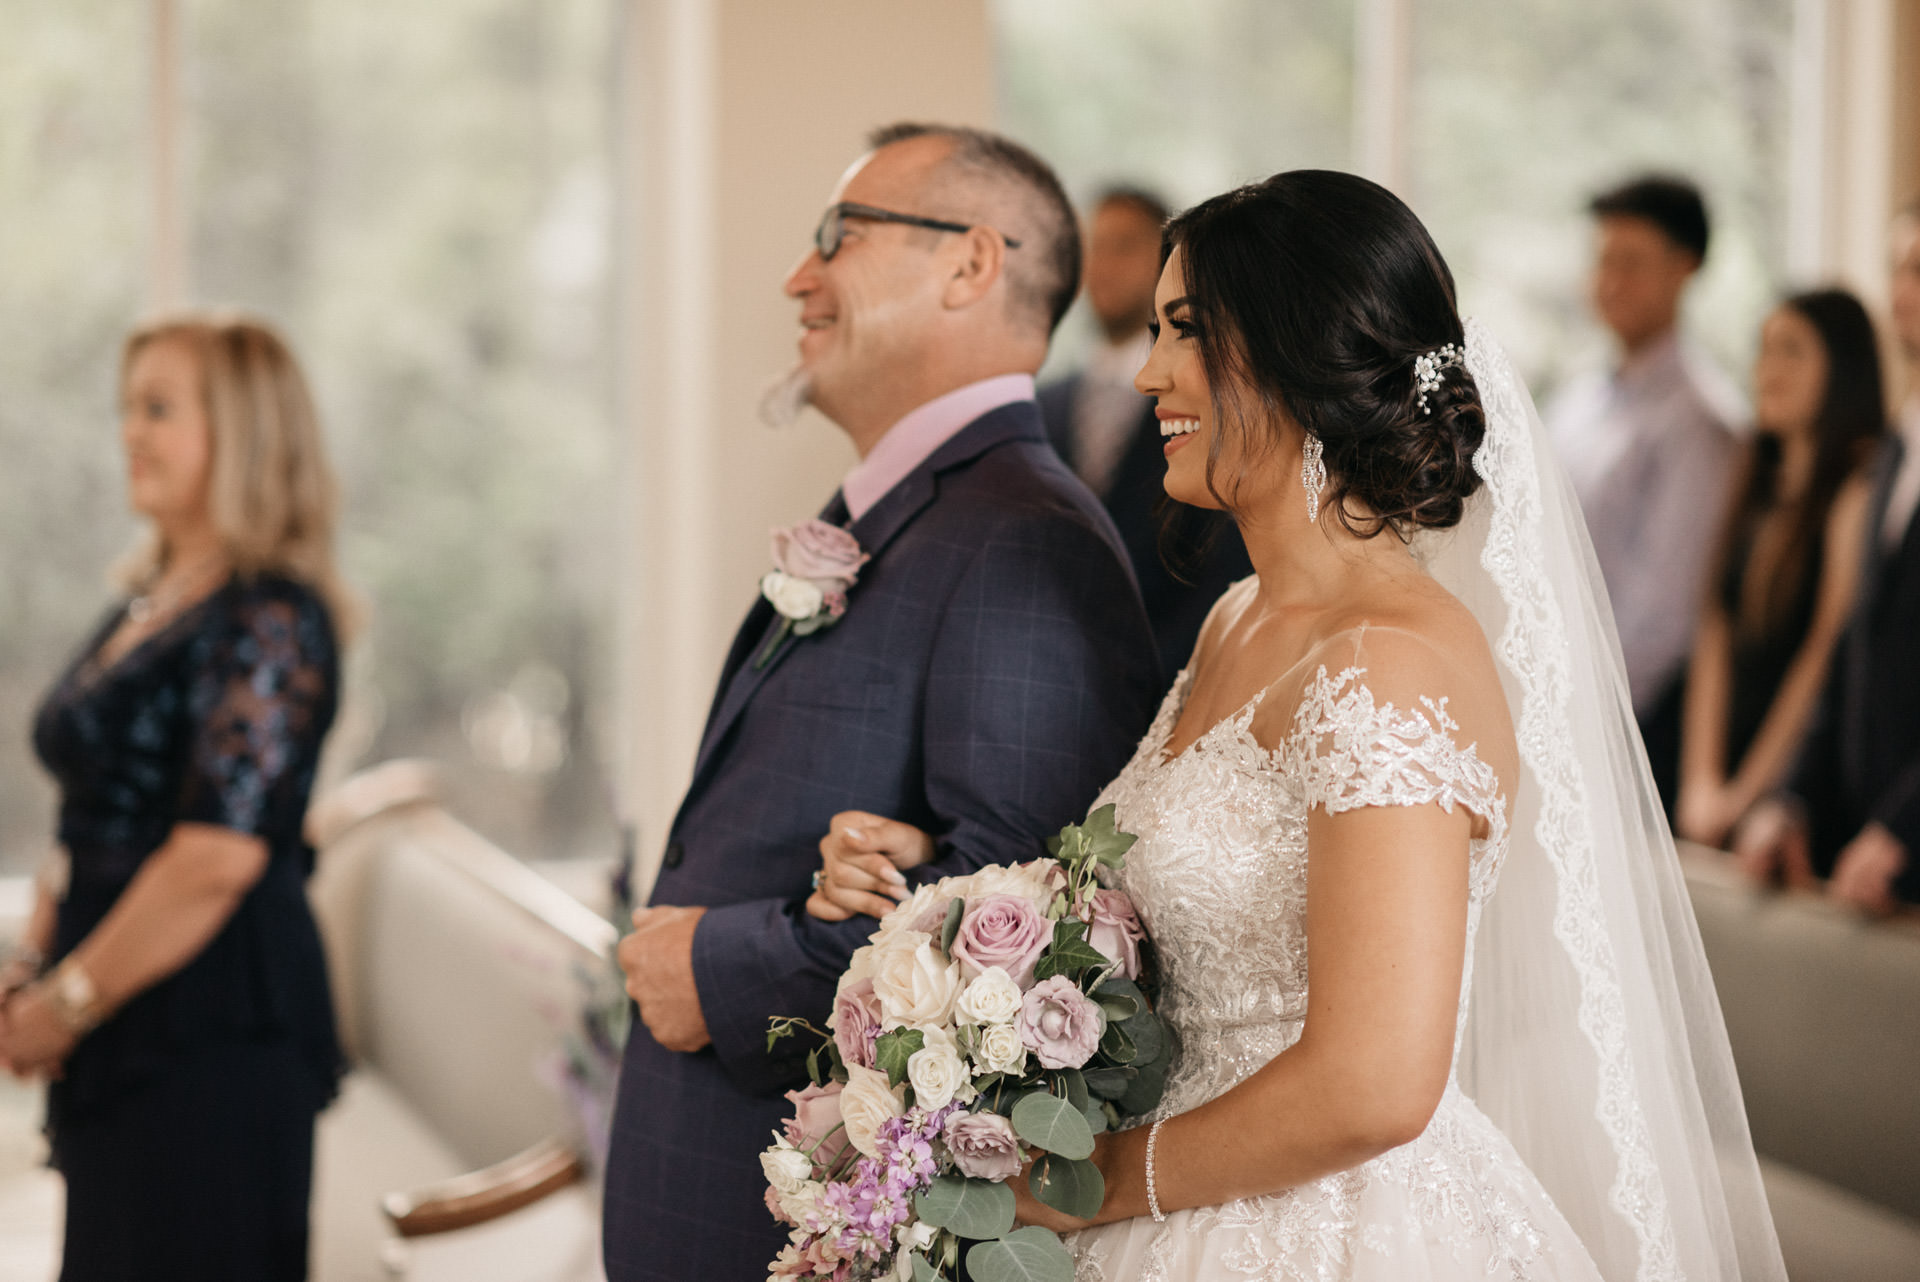 lexi-michael-wedding-blog-sm-54.jpg